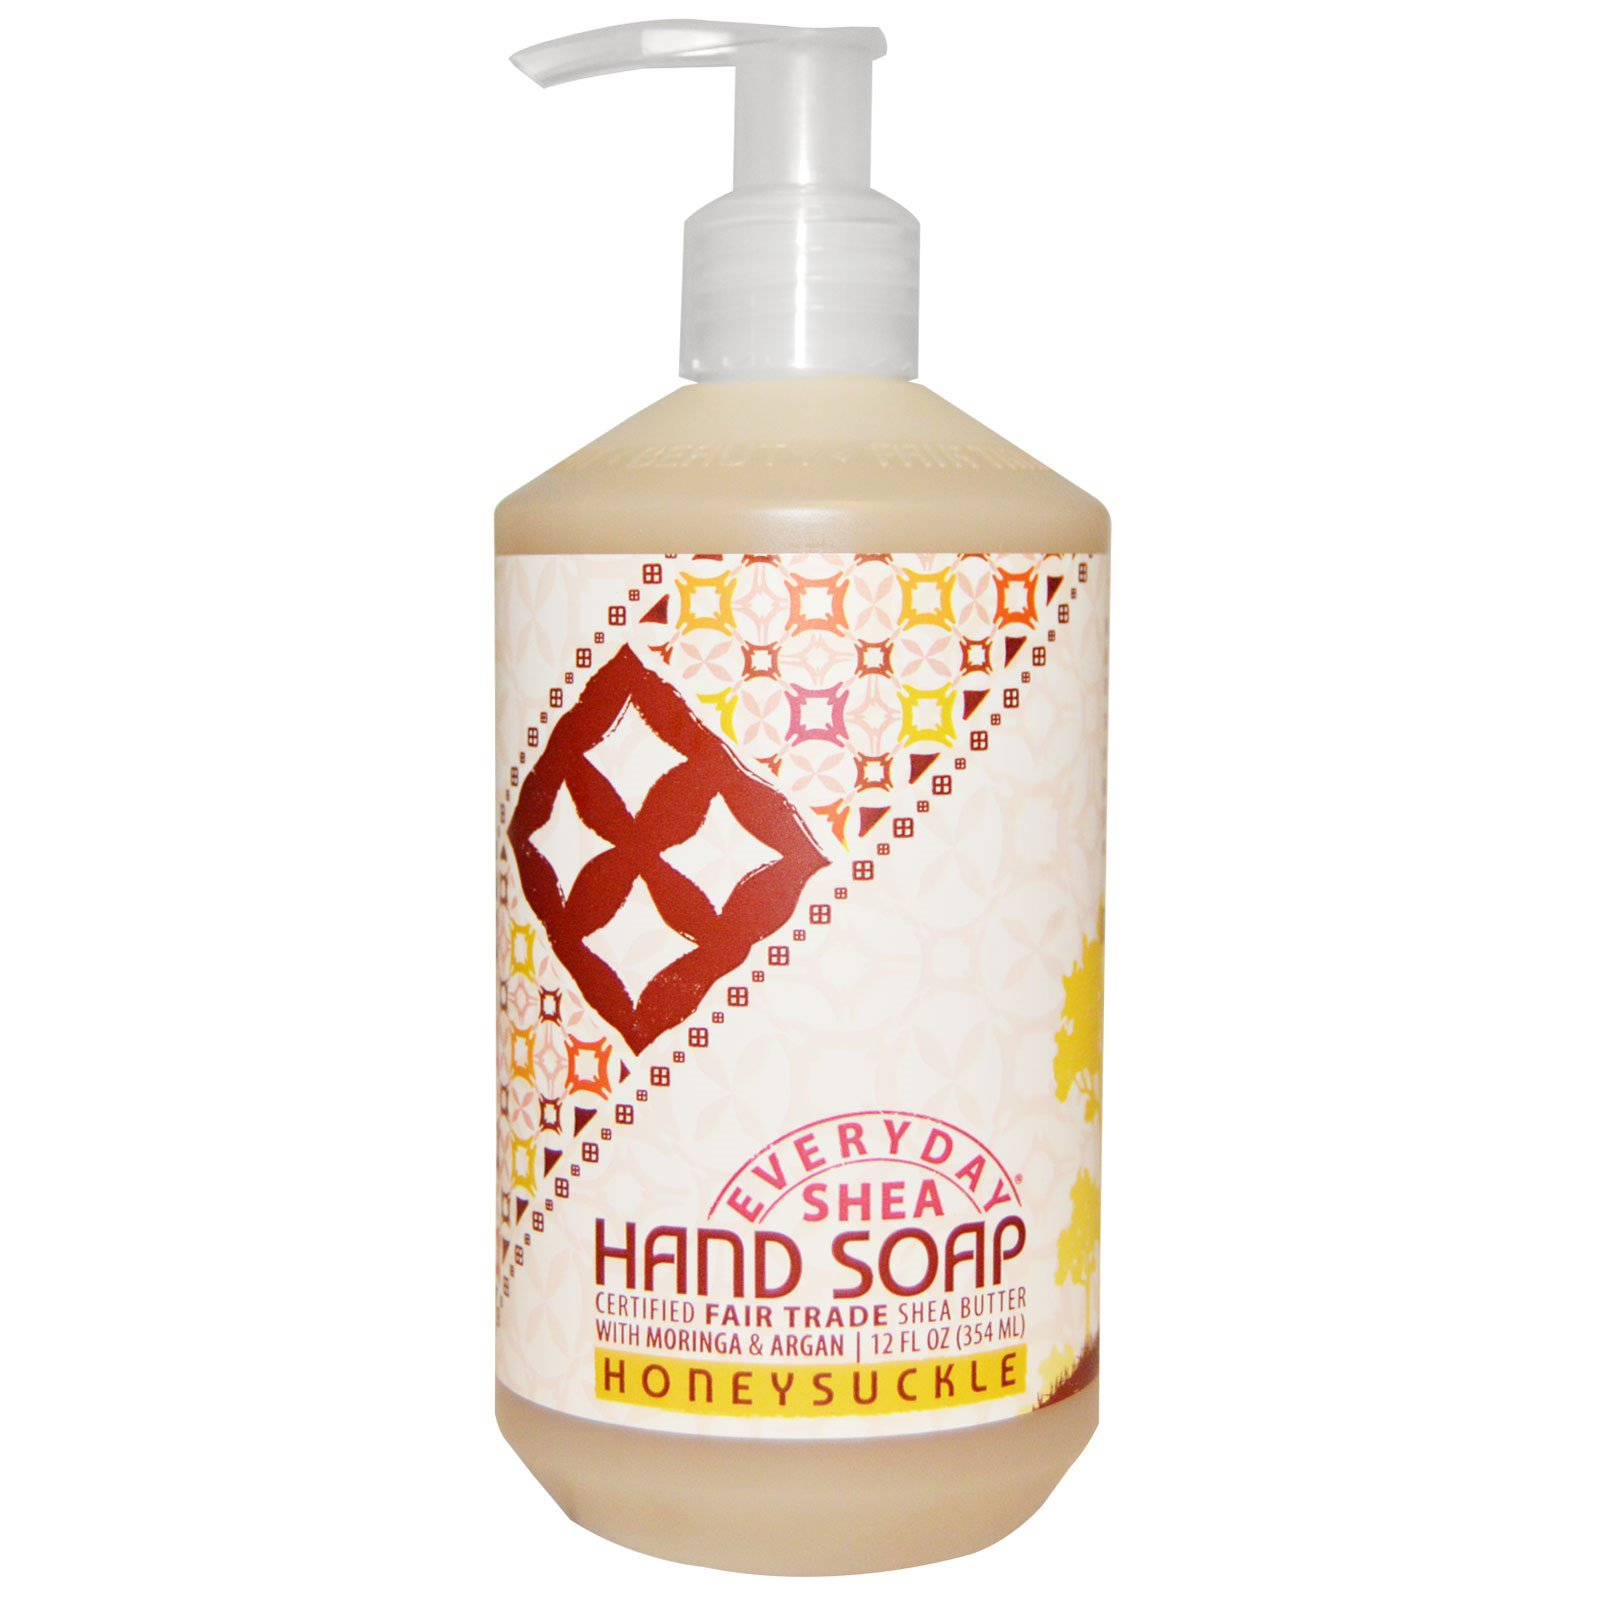 Everyday Shea, Hand Soap, Honeysuckle, 12 oz.